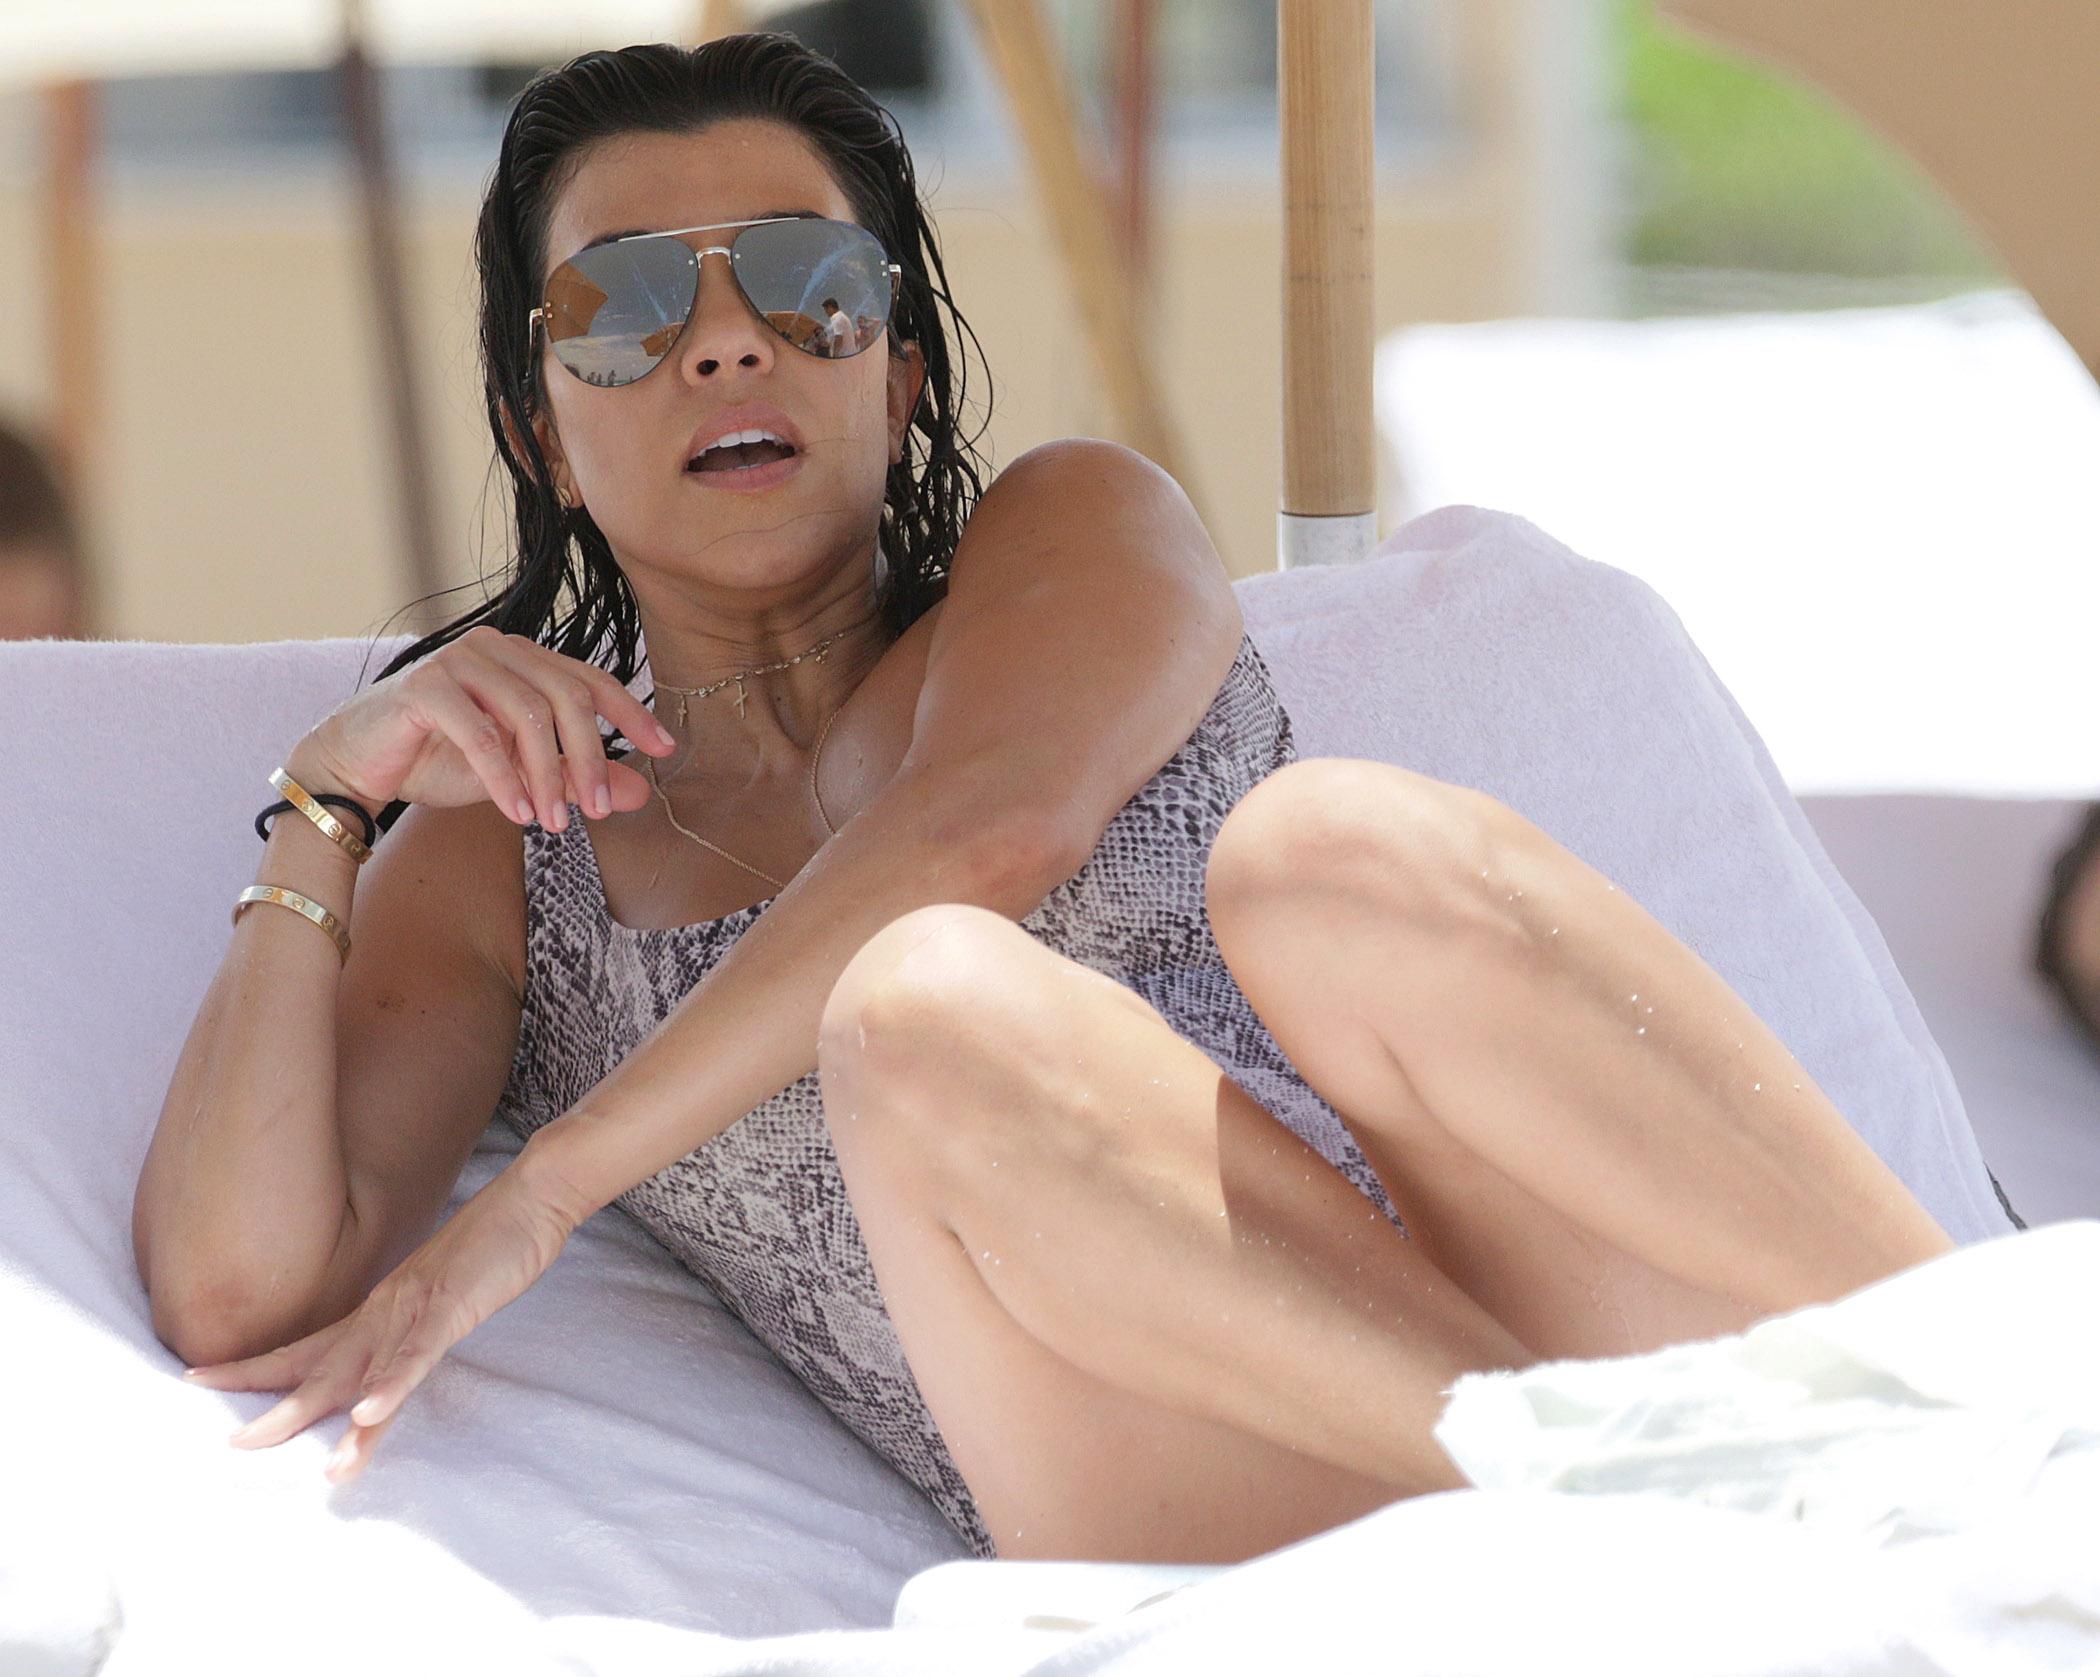 Kourtney Kardashian And Kids Seen Enjoying The Beach In Miami